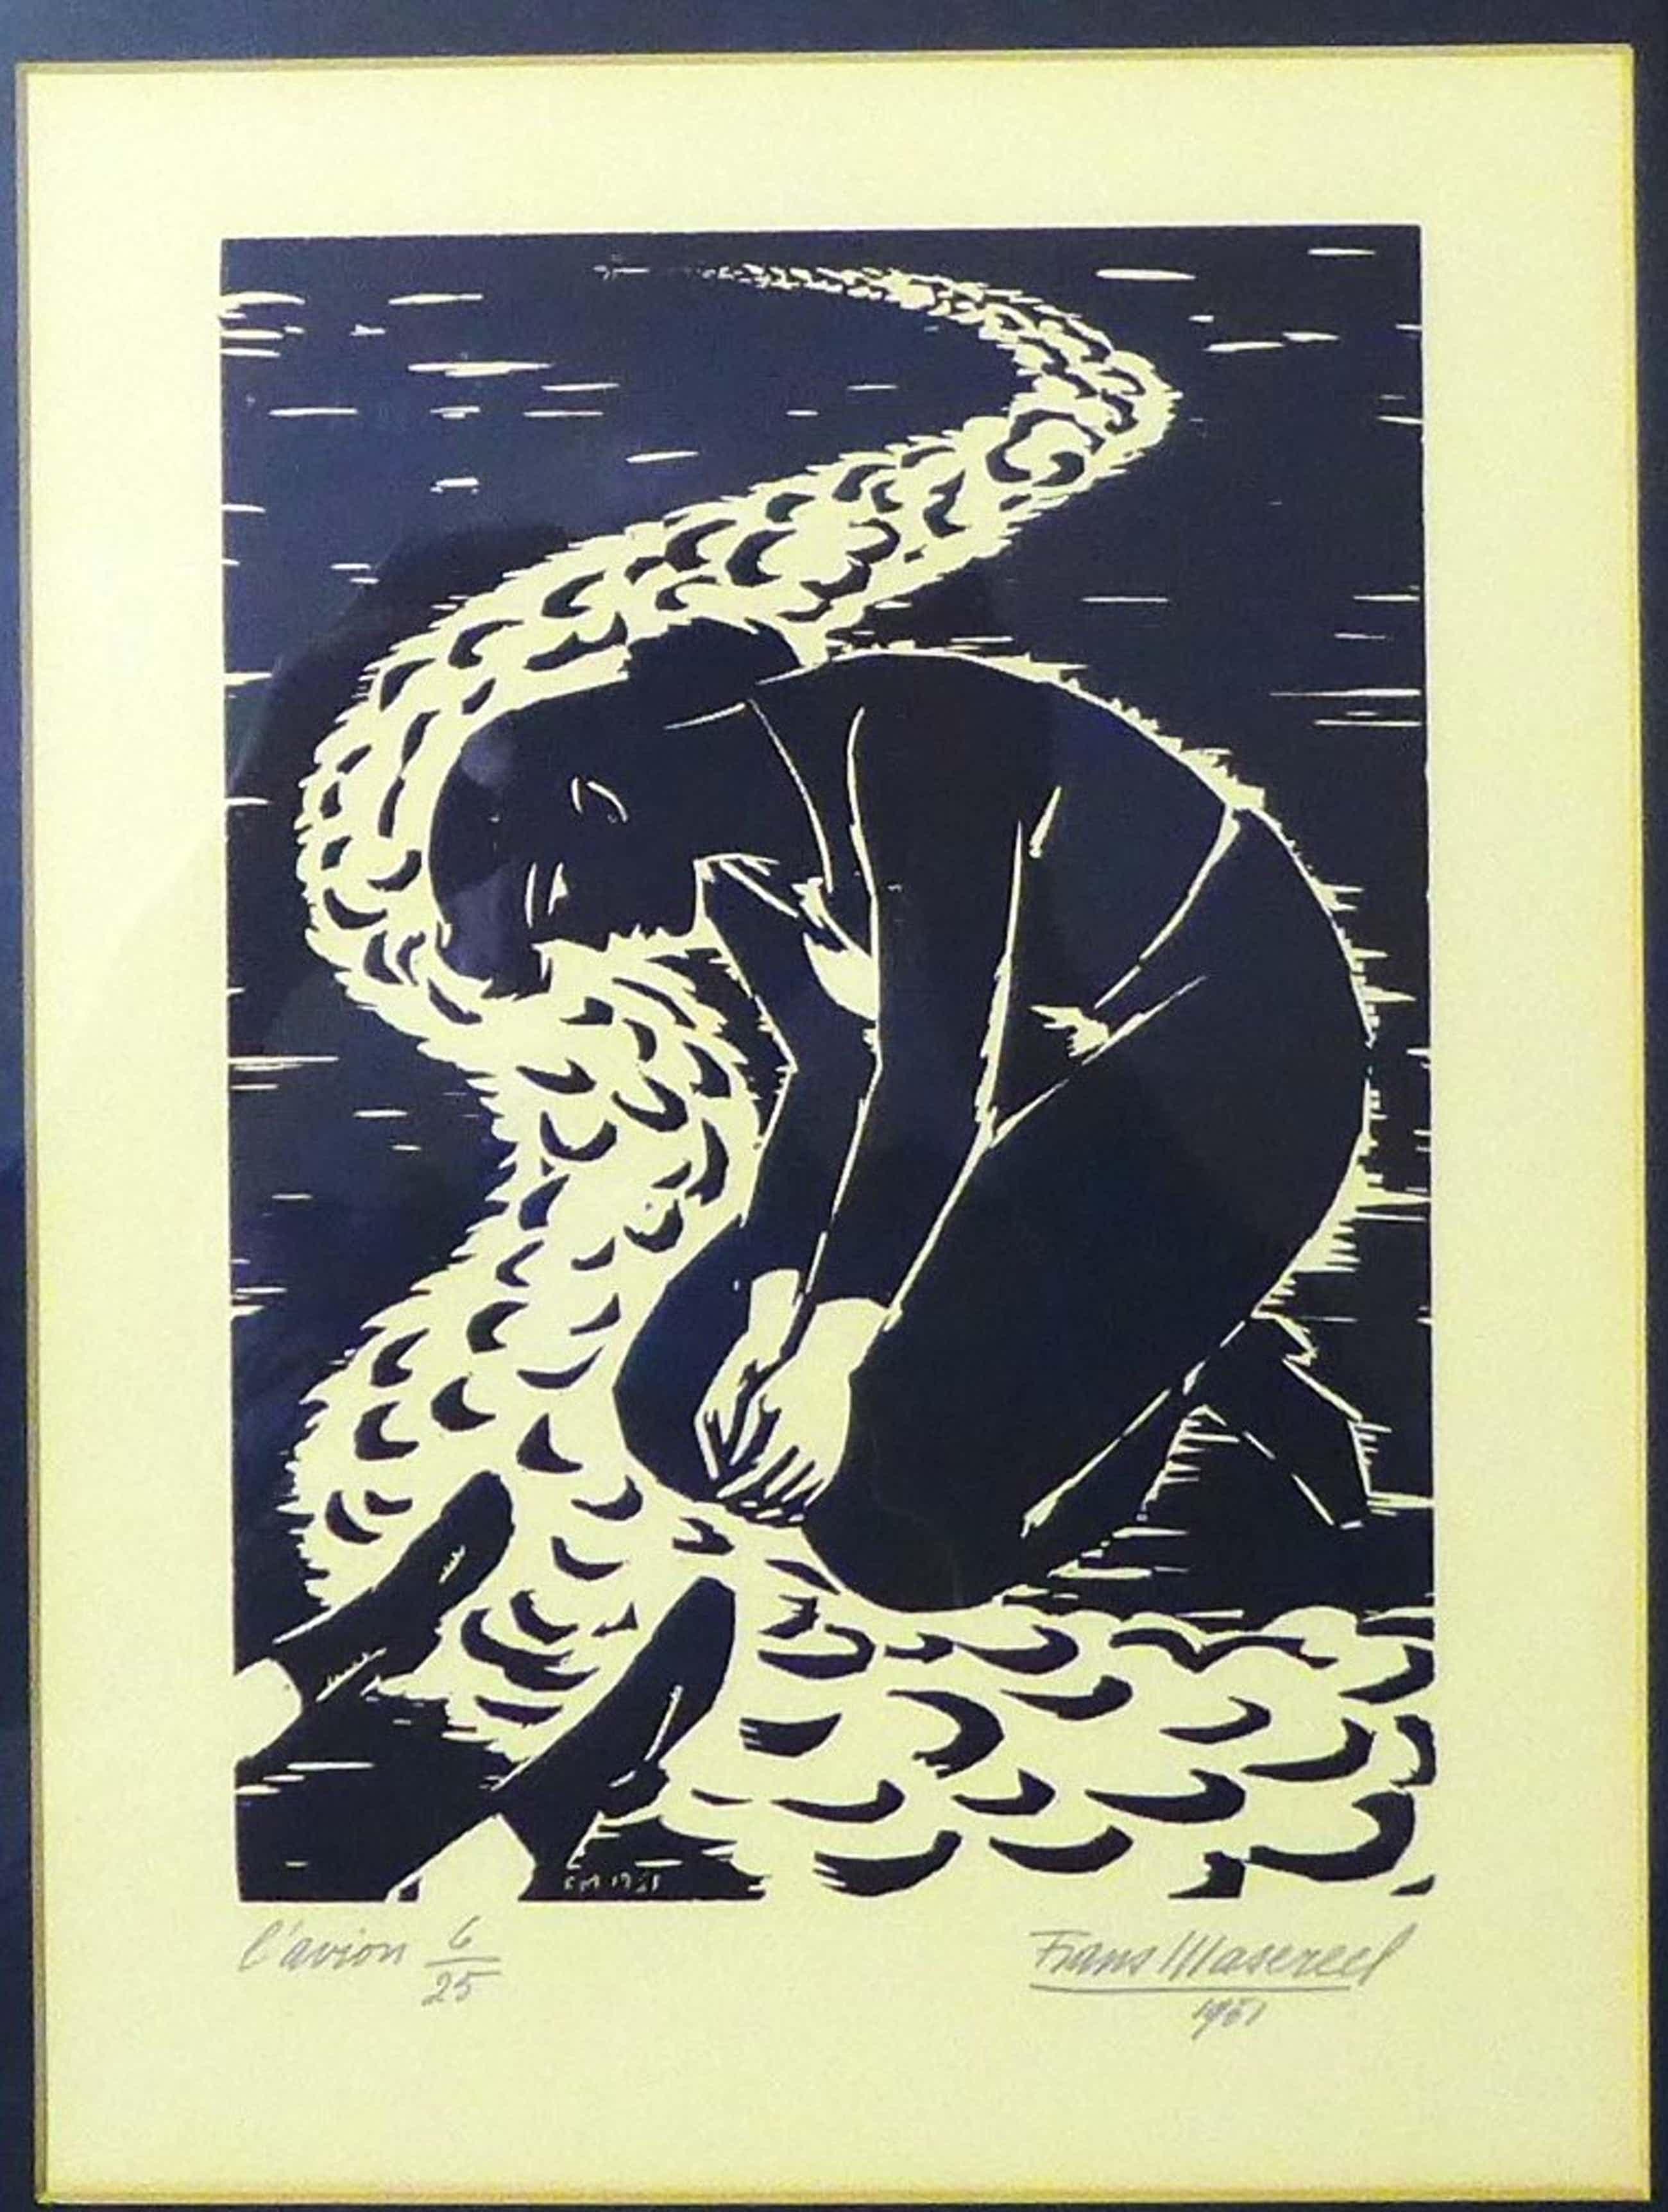 Frans Masereel - Linosnede uit 1951 kleine oplage 6/25 kopen? Bied vanaf 300!